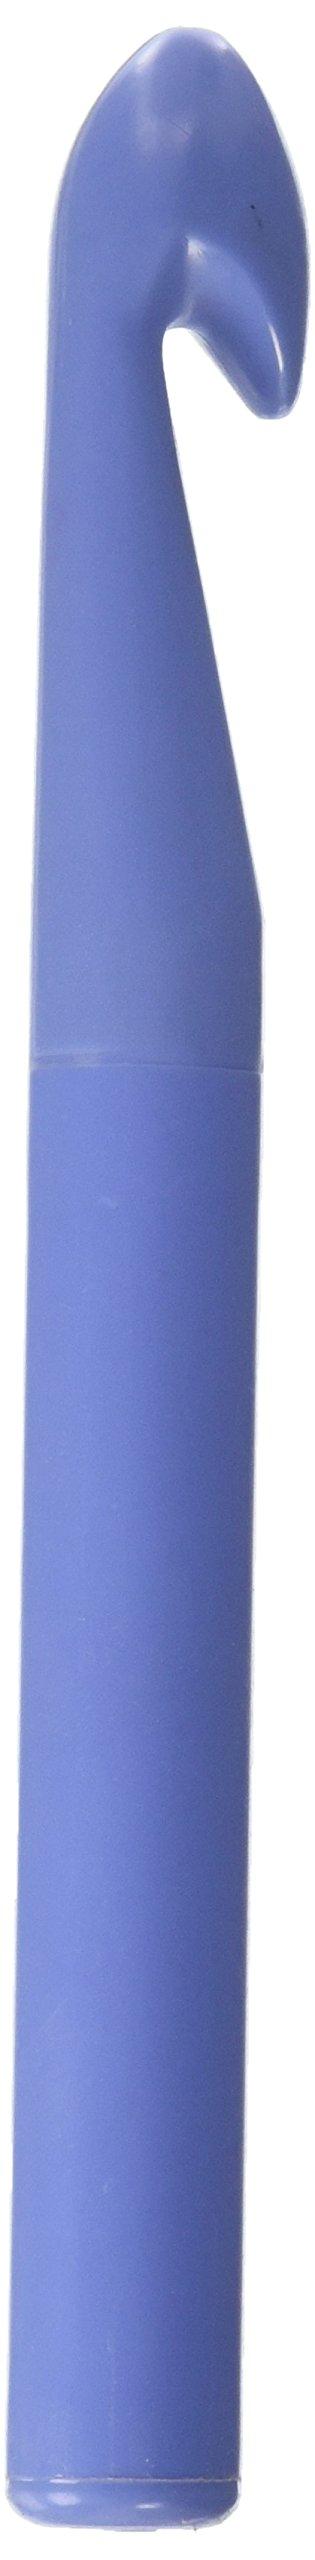 Boye - 333623200Smm Aguja de Crochet Jumbo